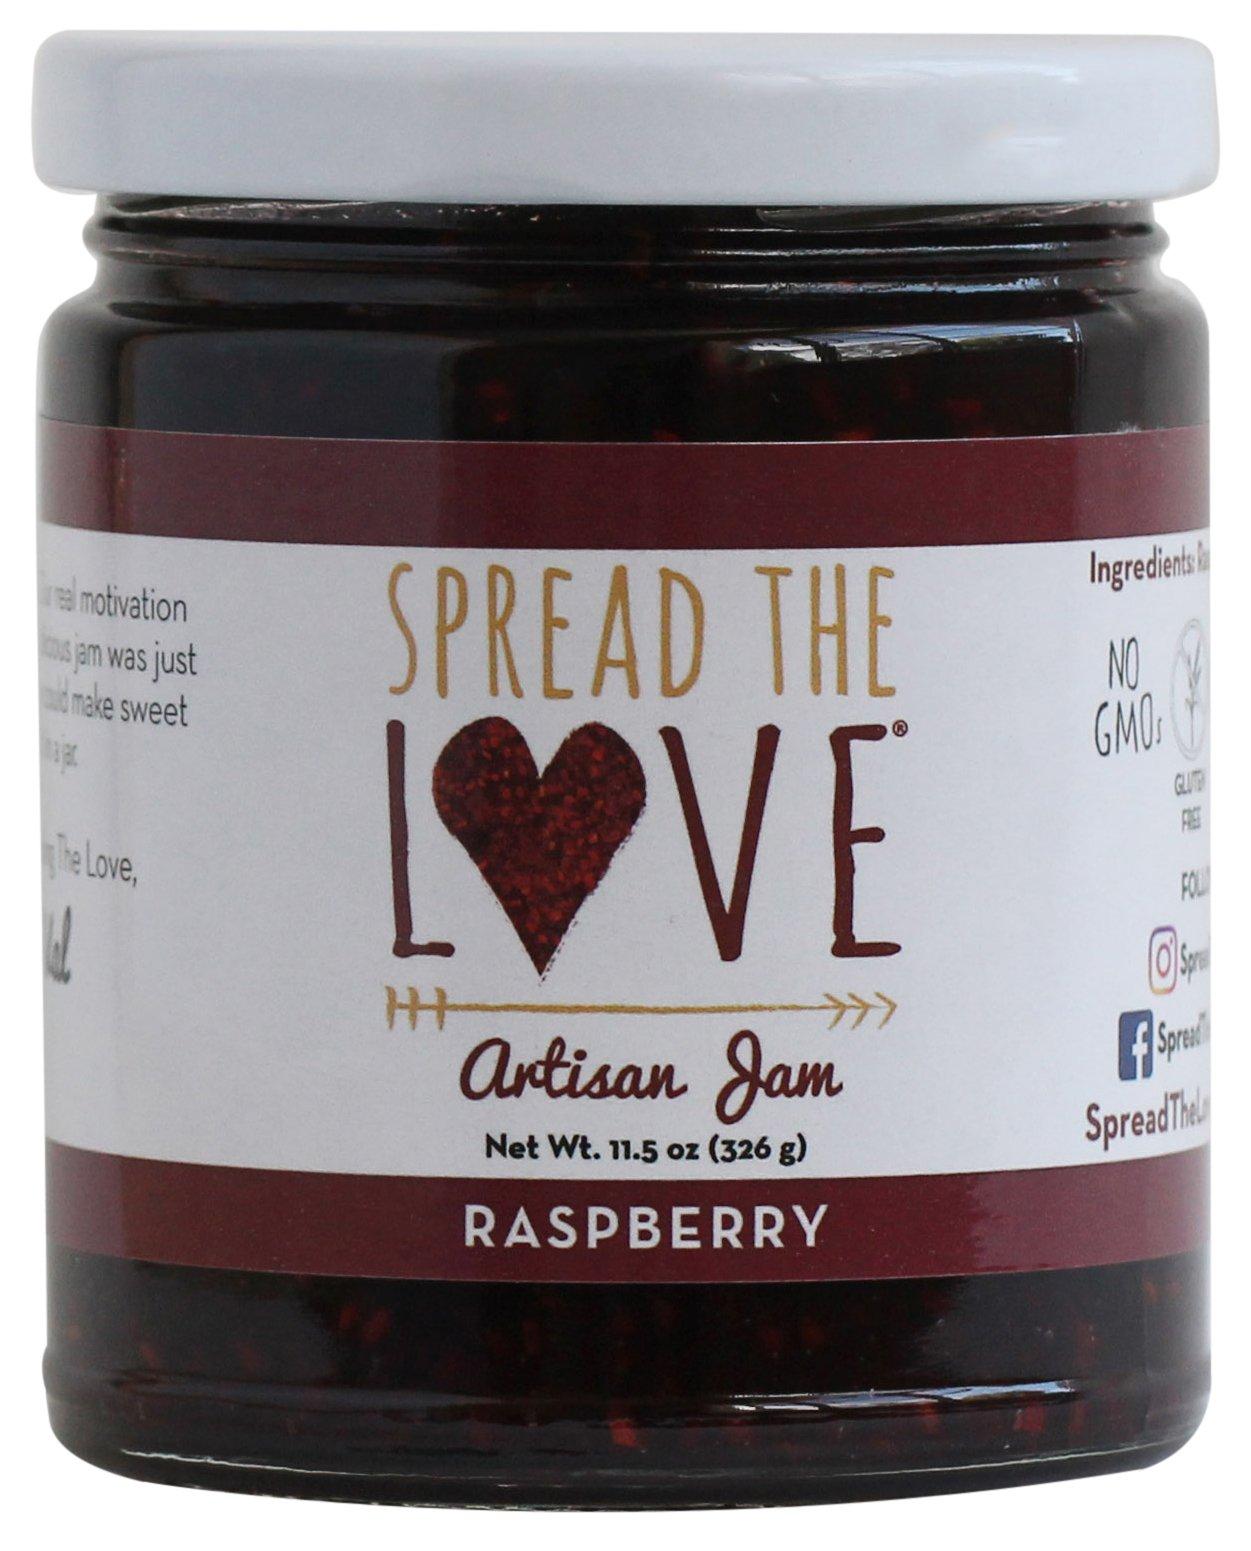 Spread The Love Artisan Jam, Raspberry (All Natural, Vegan, Gluten-free, No added salt, No pectin)